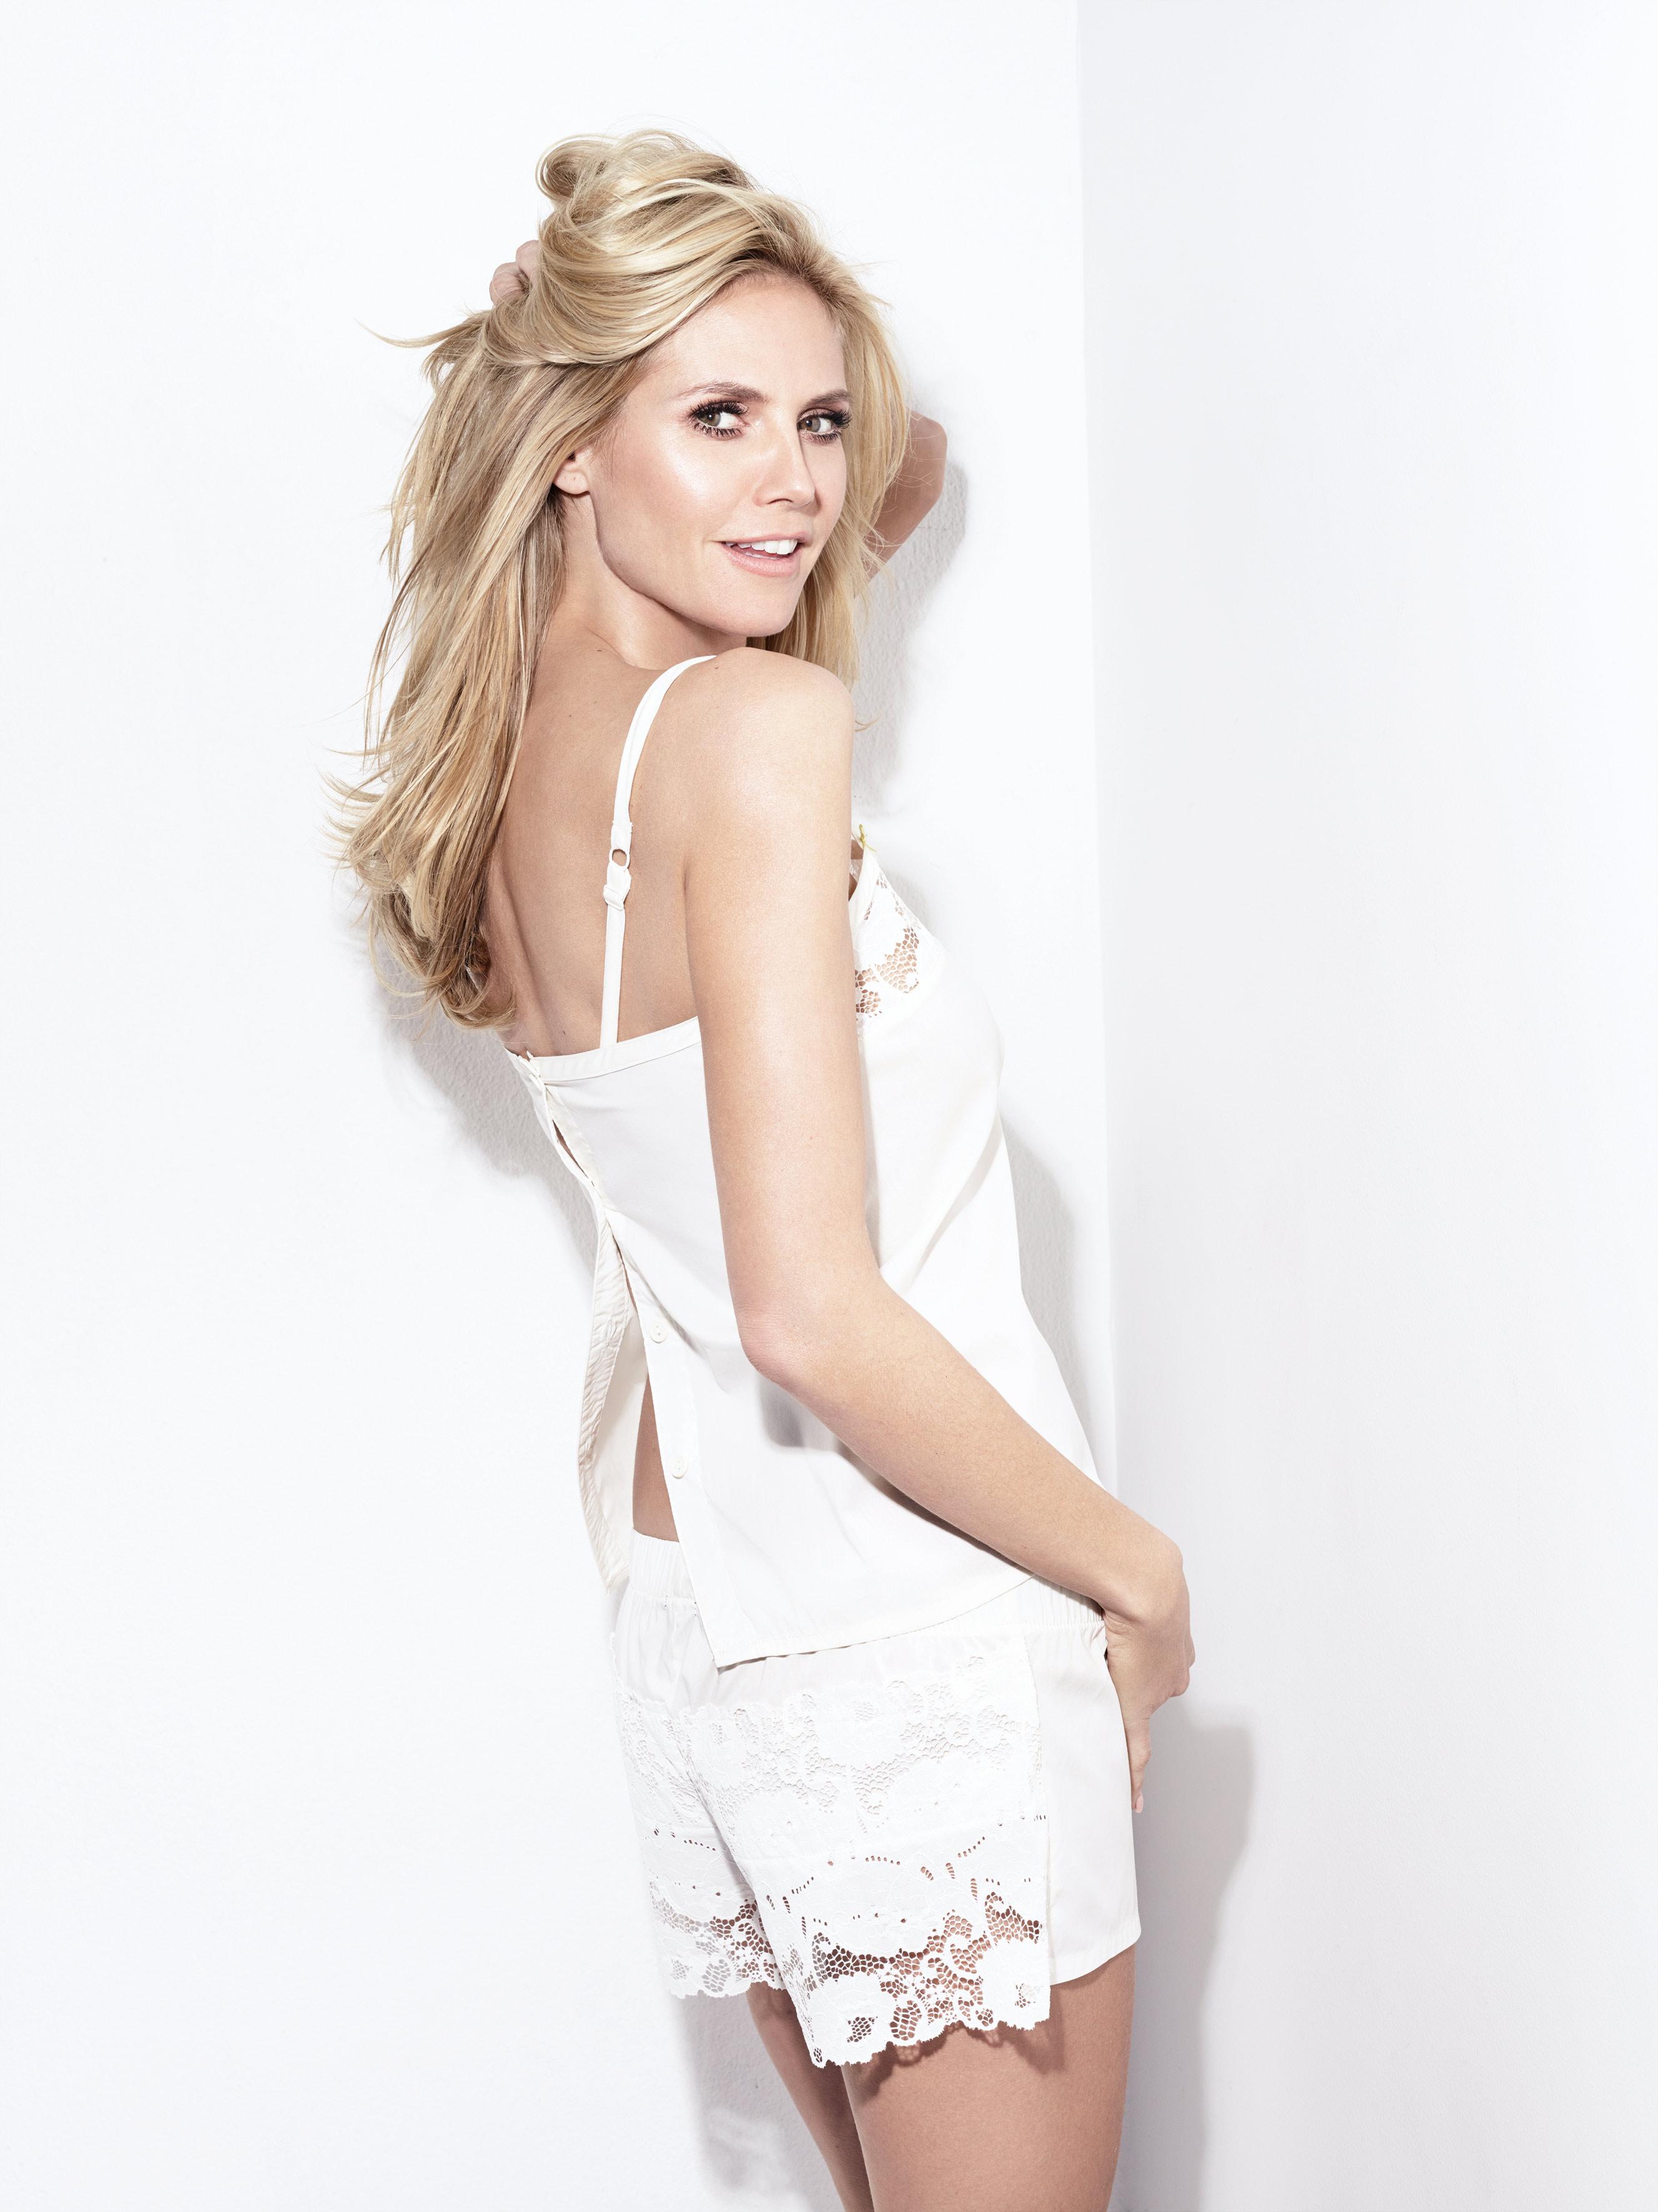 Heidi Klum launches her new season of lingerie called S2.16.